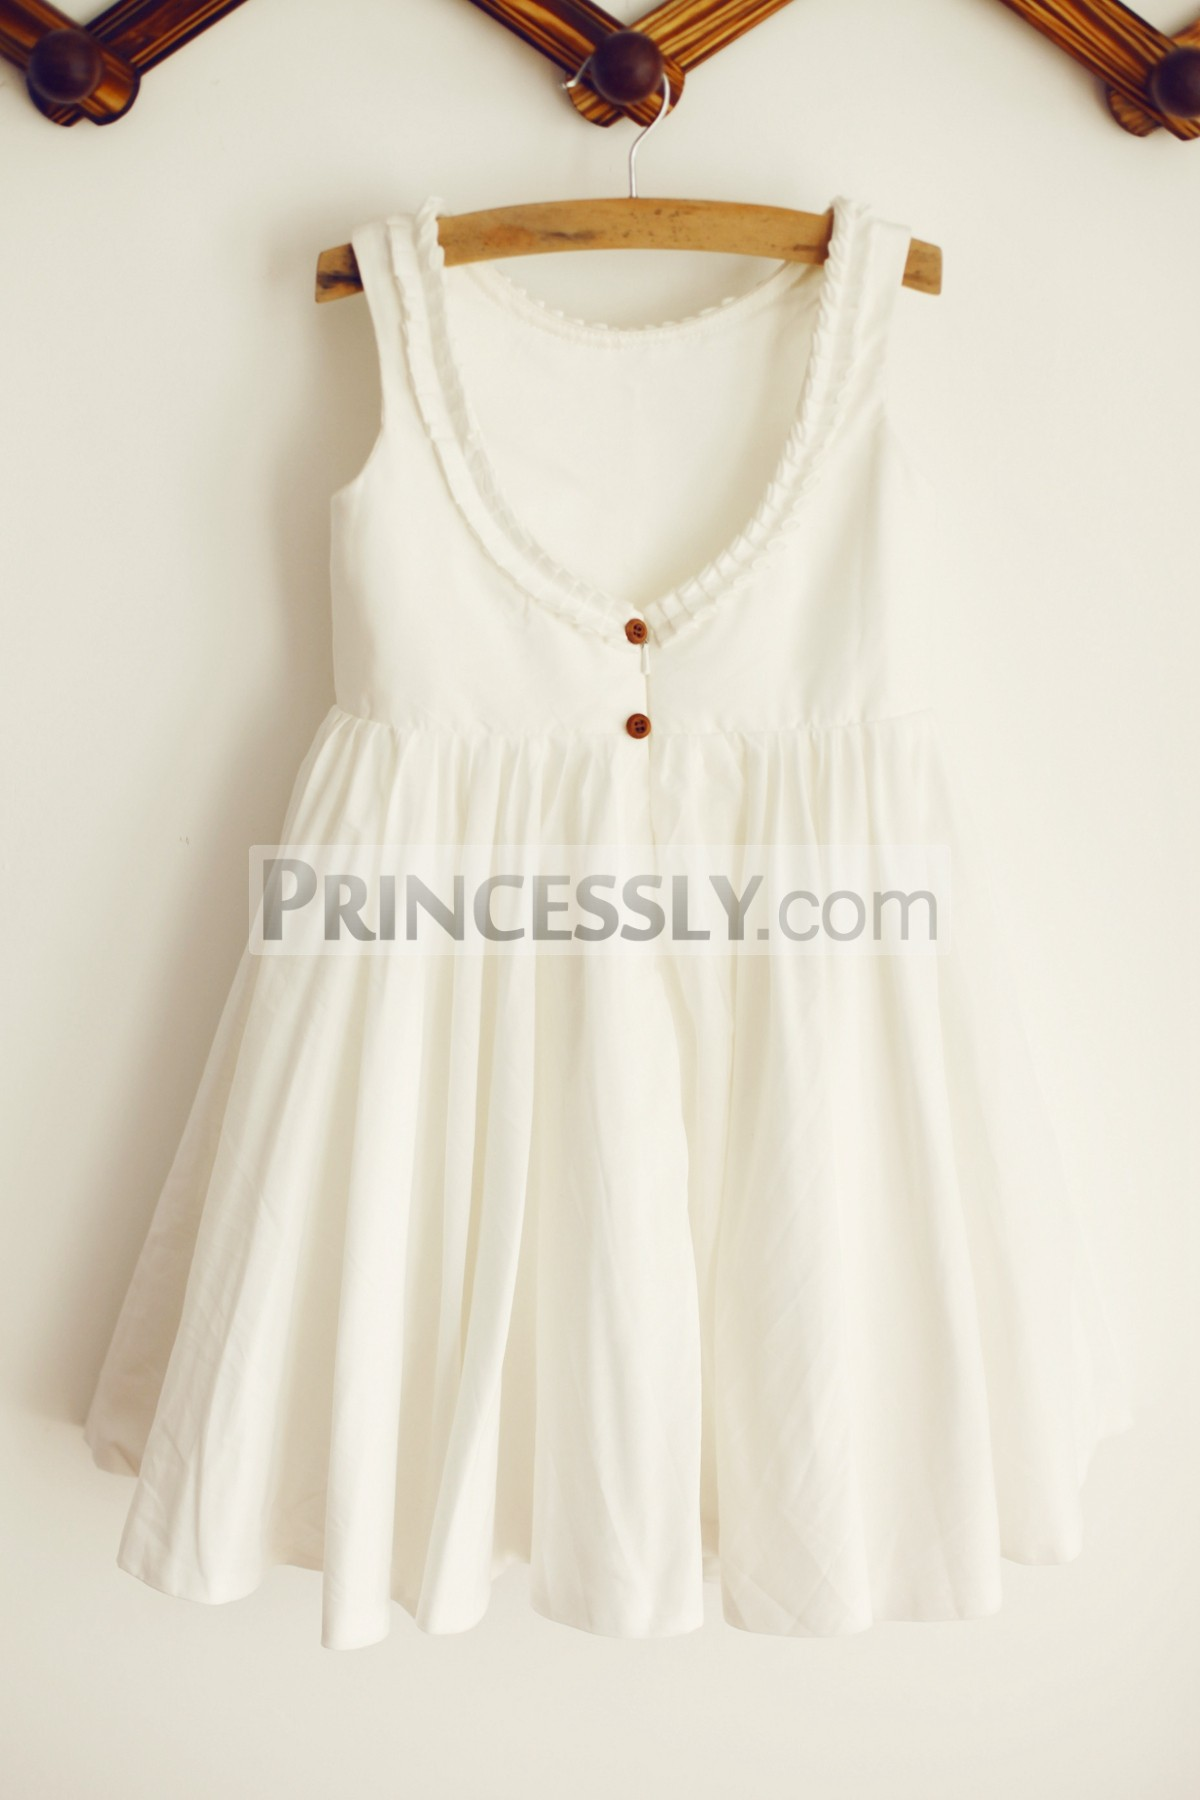 Princessly.com-K1003205-U Back Ivory Cotton Ruffle Neckline Flower Girl Dress-32